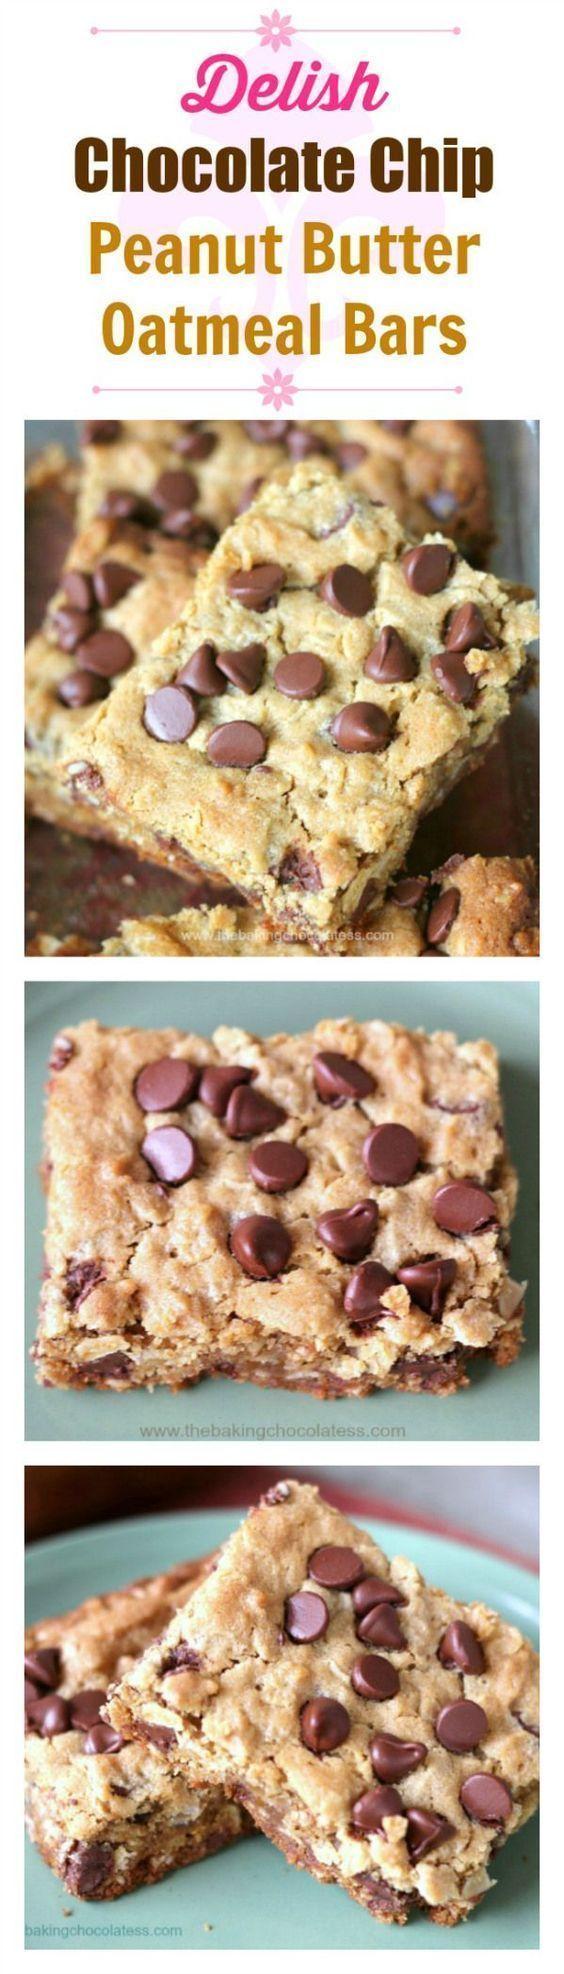 Delish Chocolate Chip Peanut Butter Oatmeal Bars – The Baking ChocolaTess